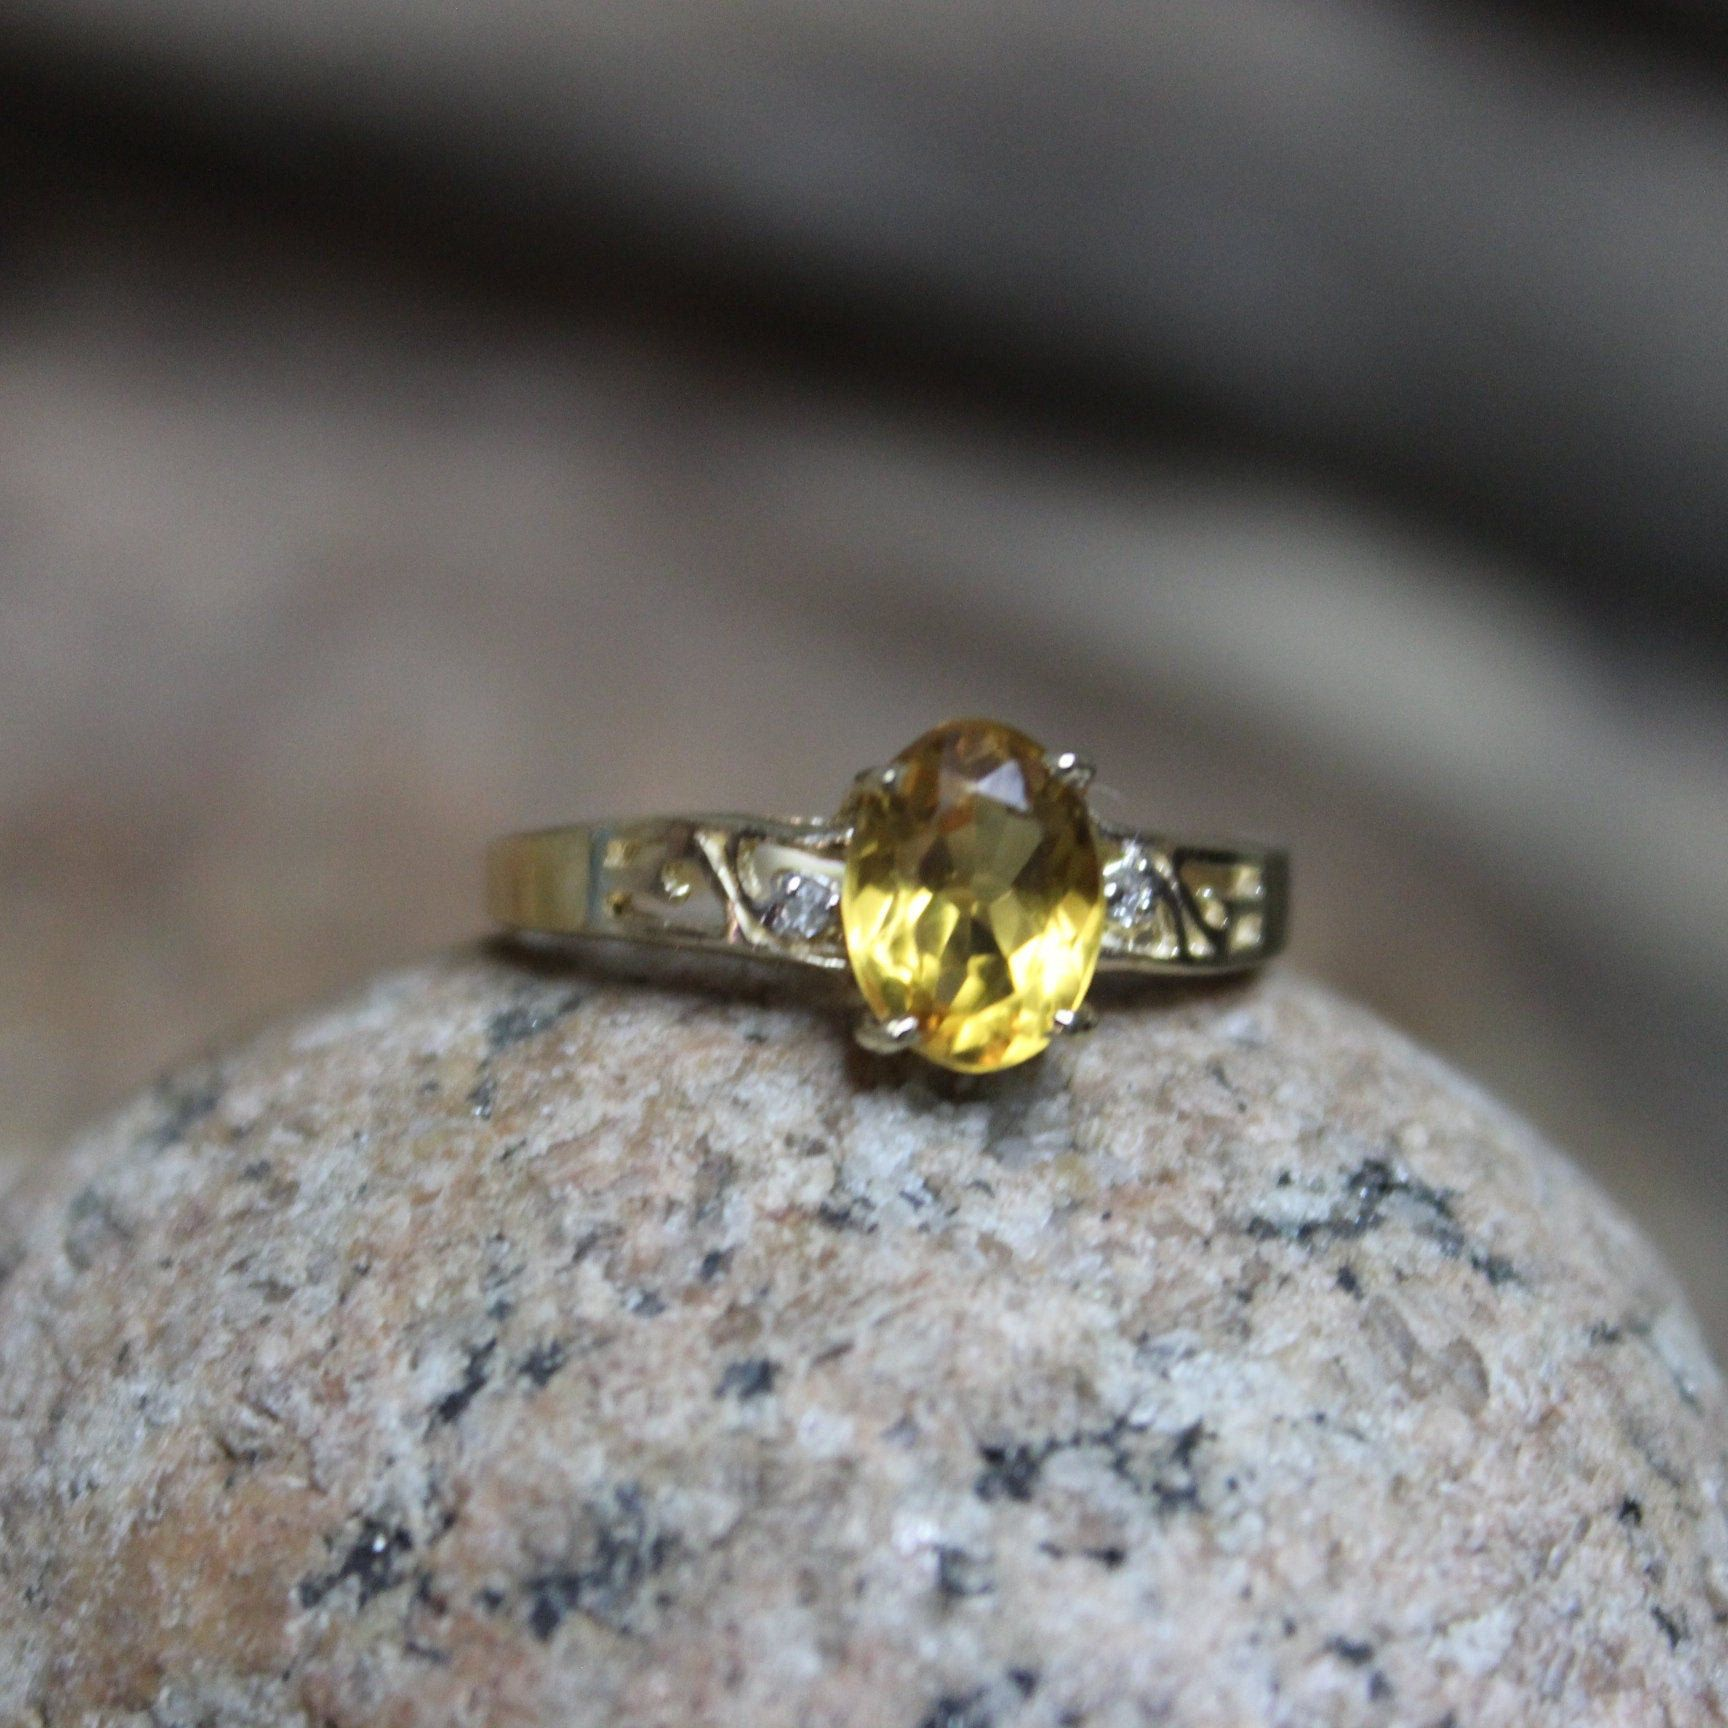 1990 S Vintage 10k Solid Gold Citrine Diamond Ring 1 9 Etsy In 2020 Citrine Ring 10k Gold Ring Vintage Rings